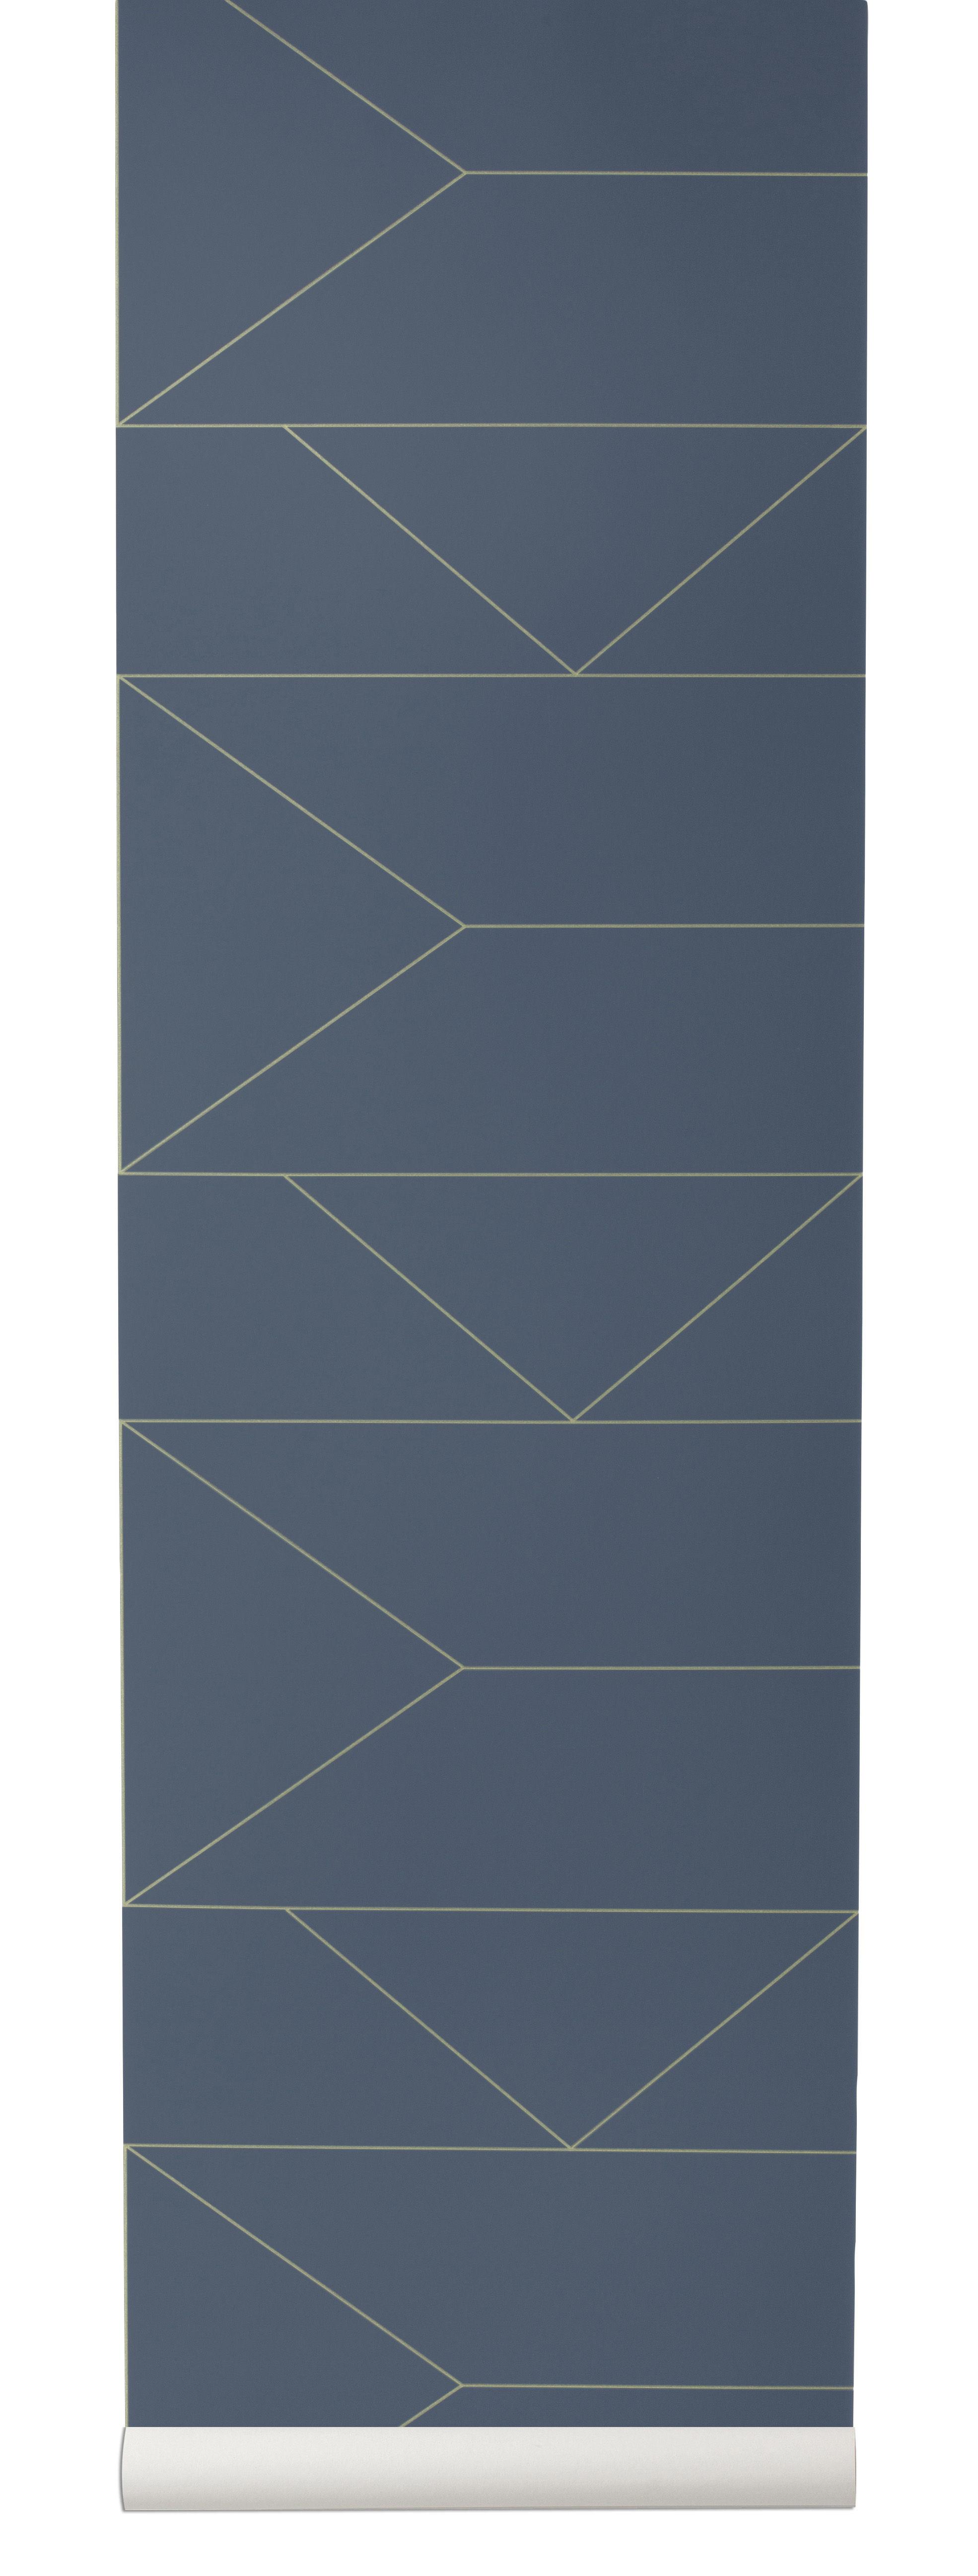 papier peint ferm living lines l 53 cm bleu or made. Black Bedroom Furniture Sets. Home Design Ideas